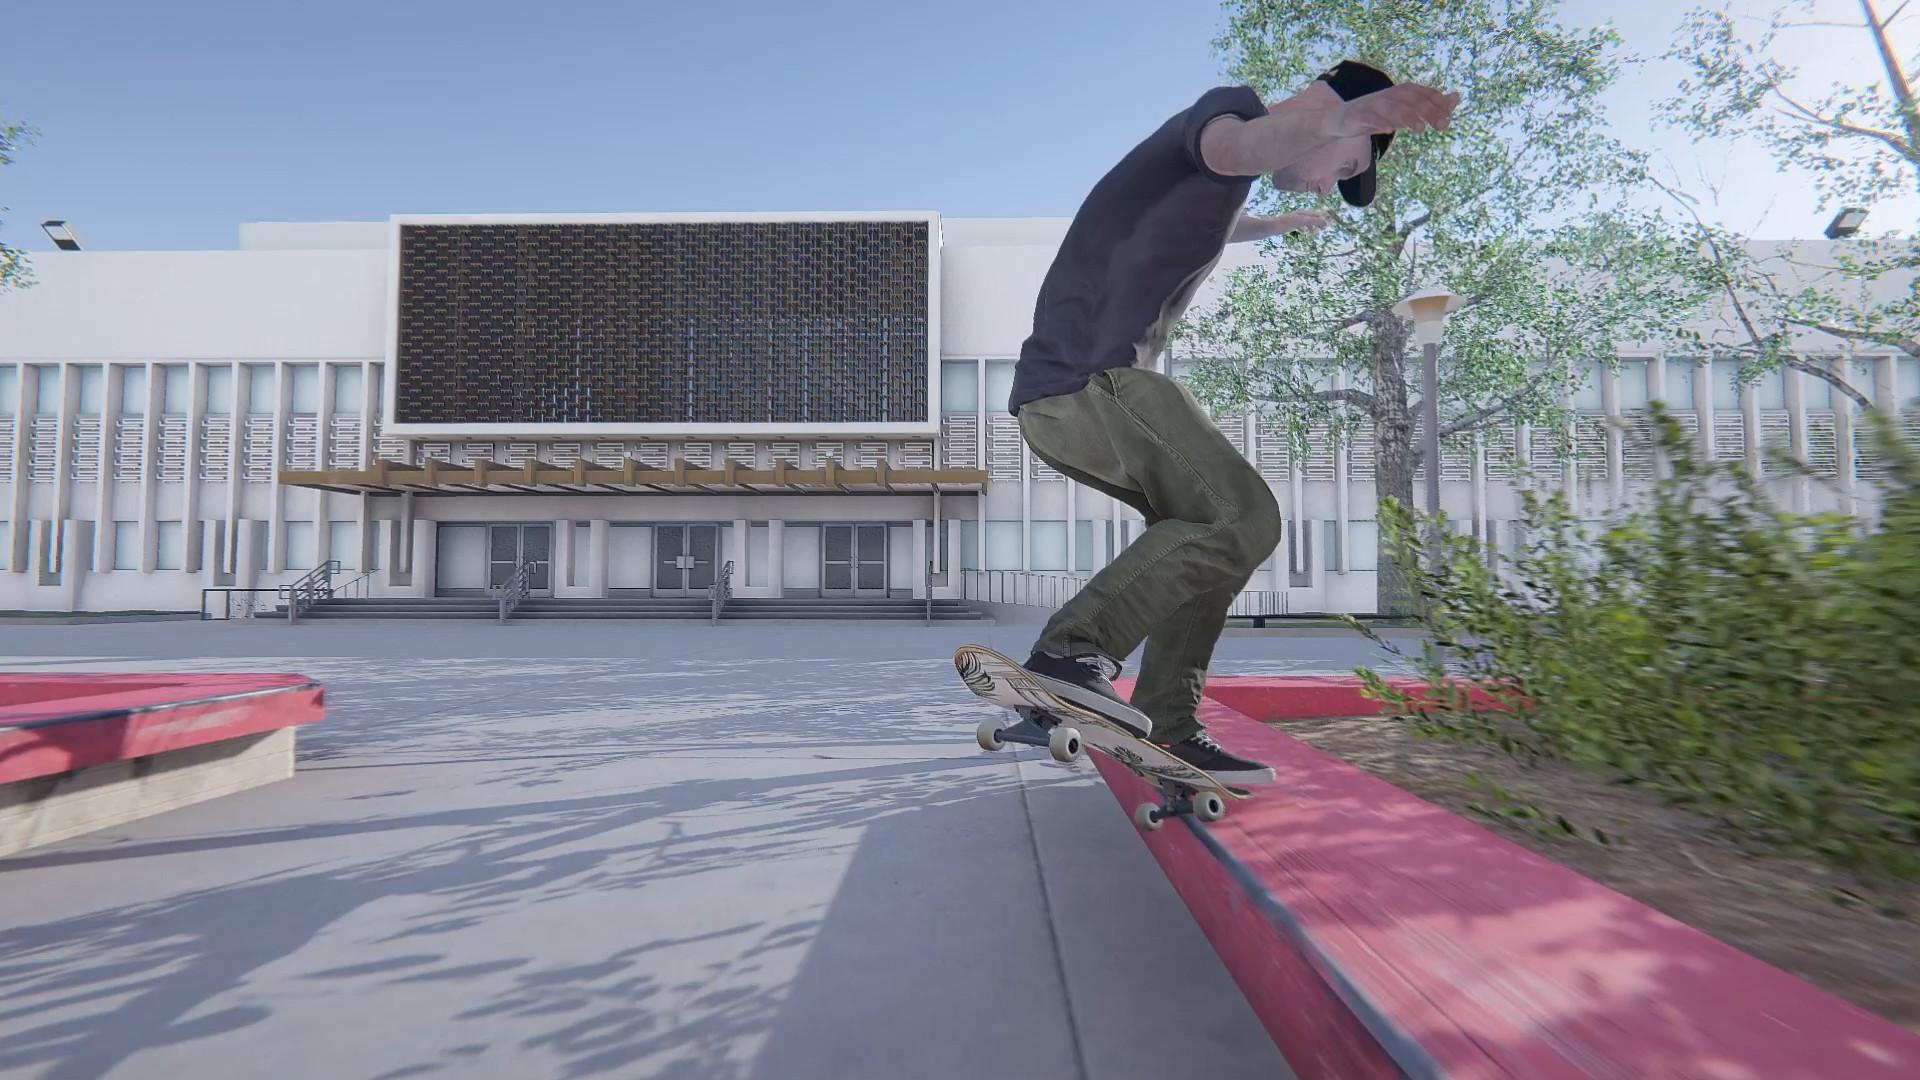 session skate game download